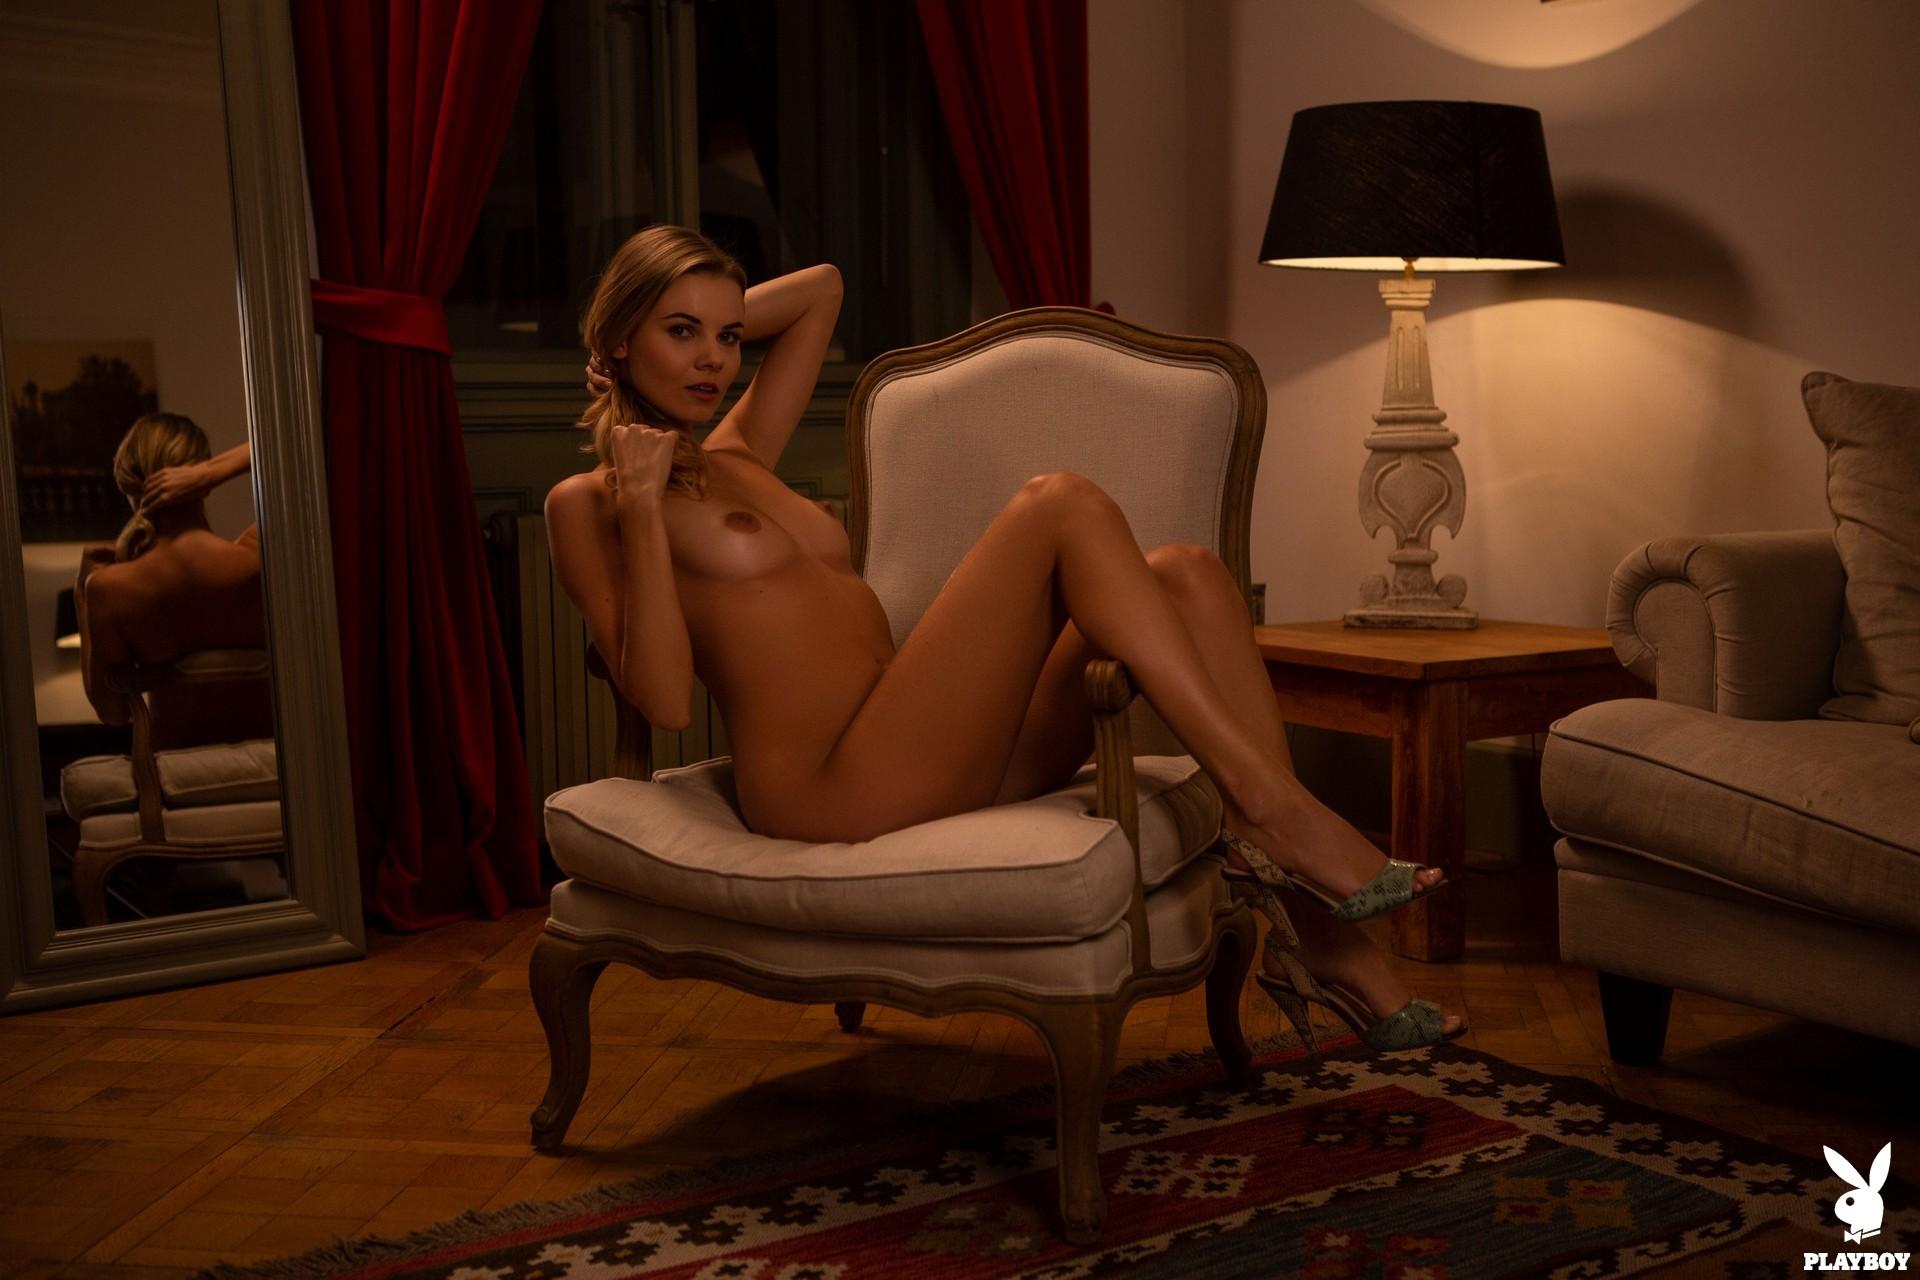 Kate Jones in Exquisite Allure - Playboy Plus 15